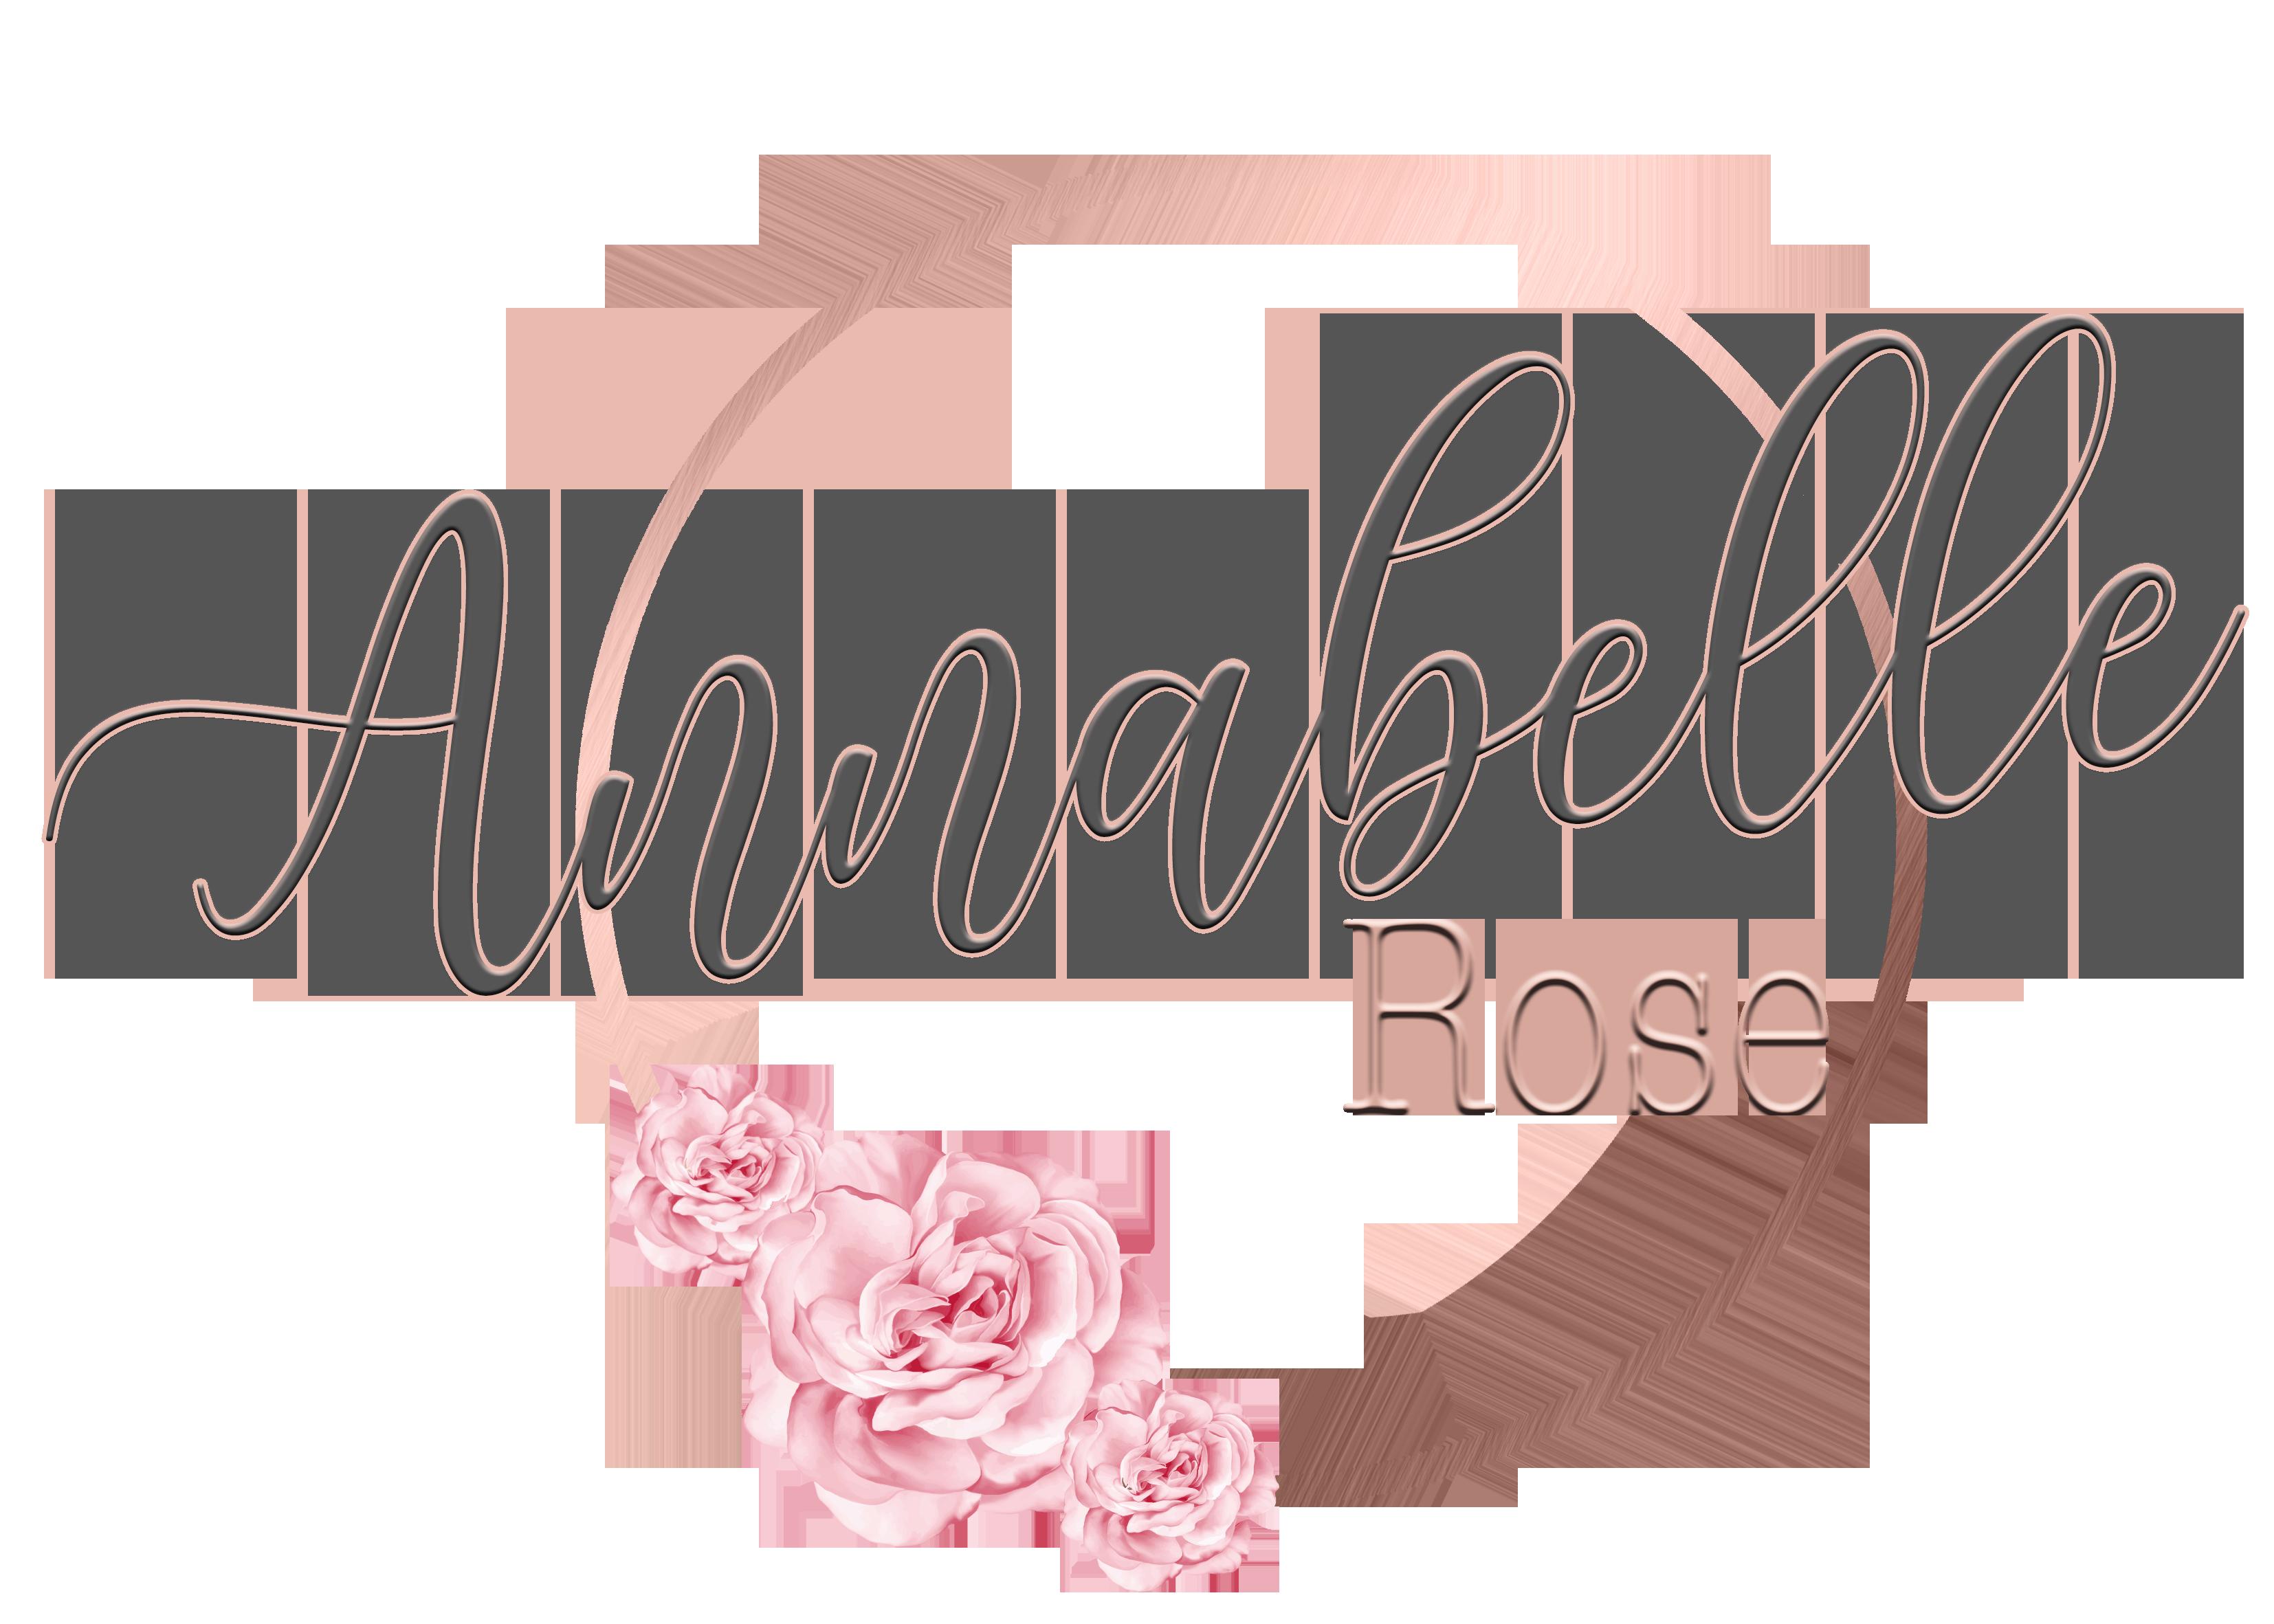 Annabelle Rose copy